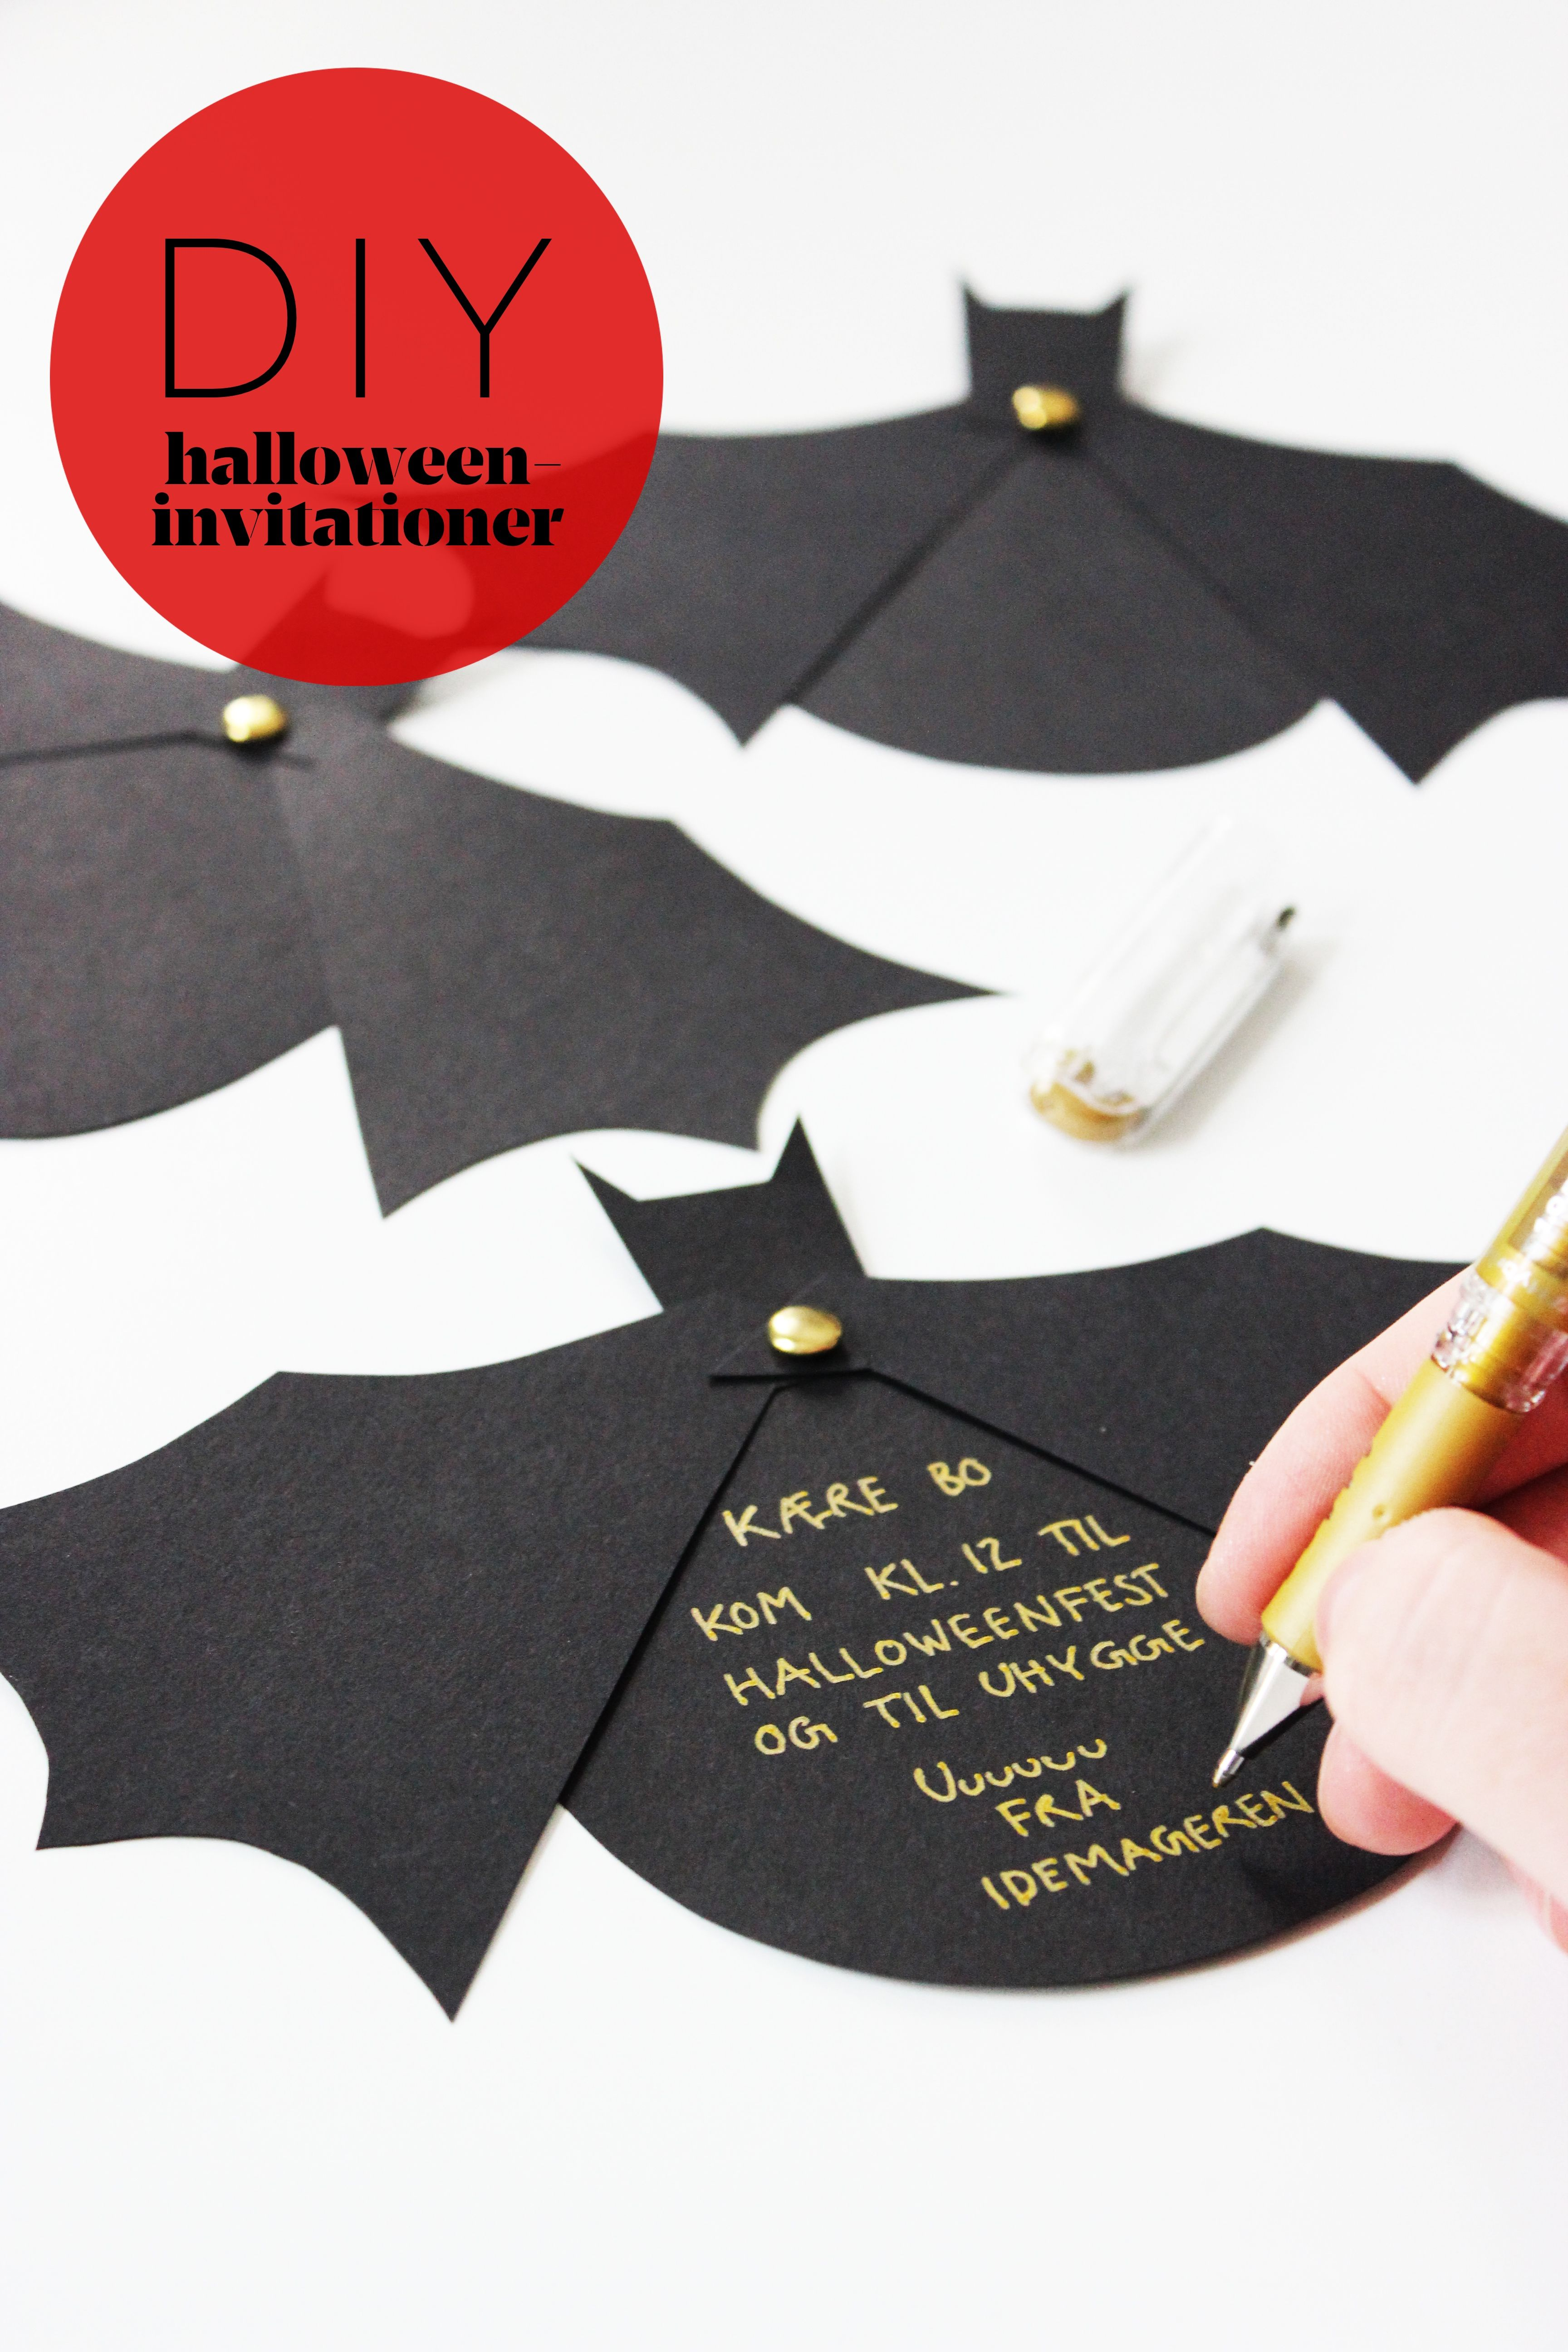 diy halloween invitation blog bog idé halloween pinterest